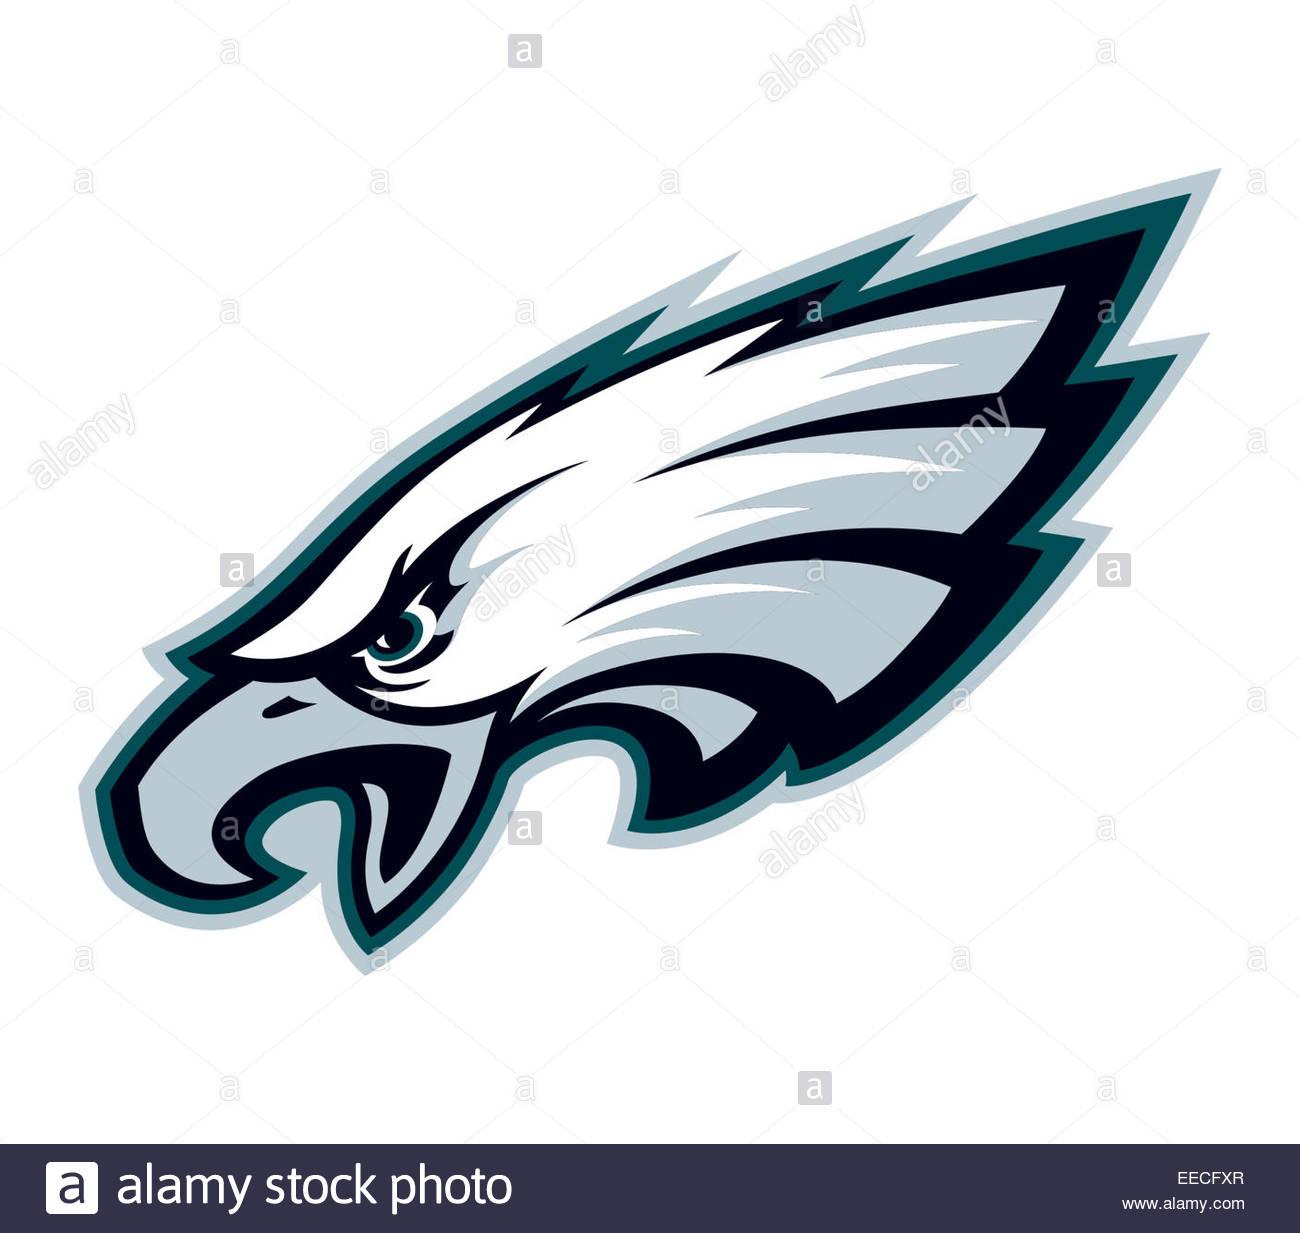 Image Result For Philadelphia Eagles